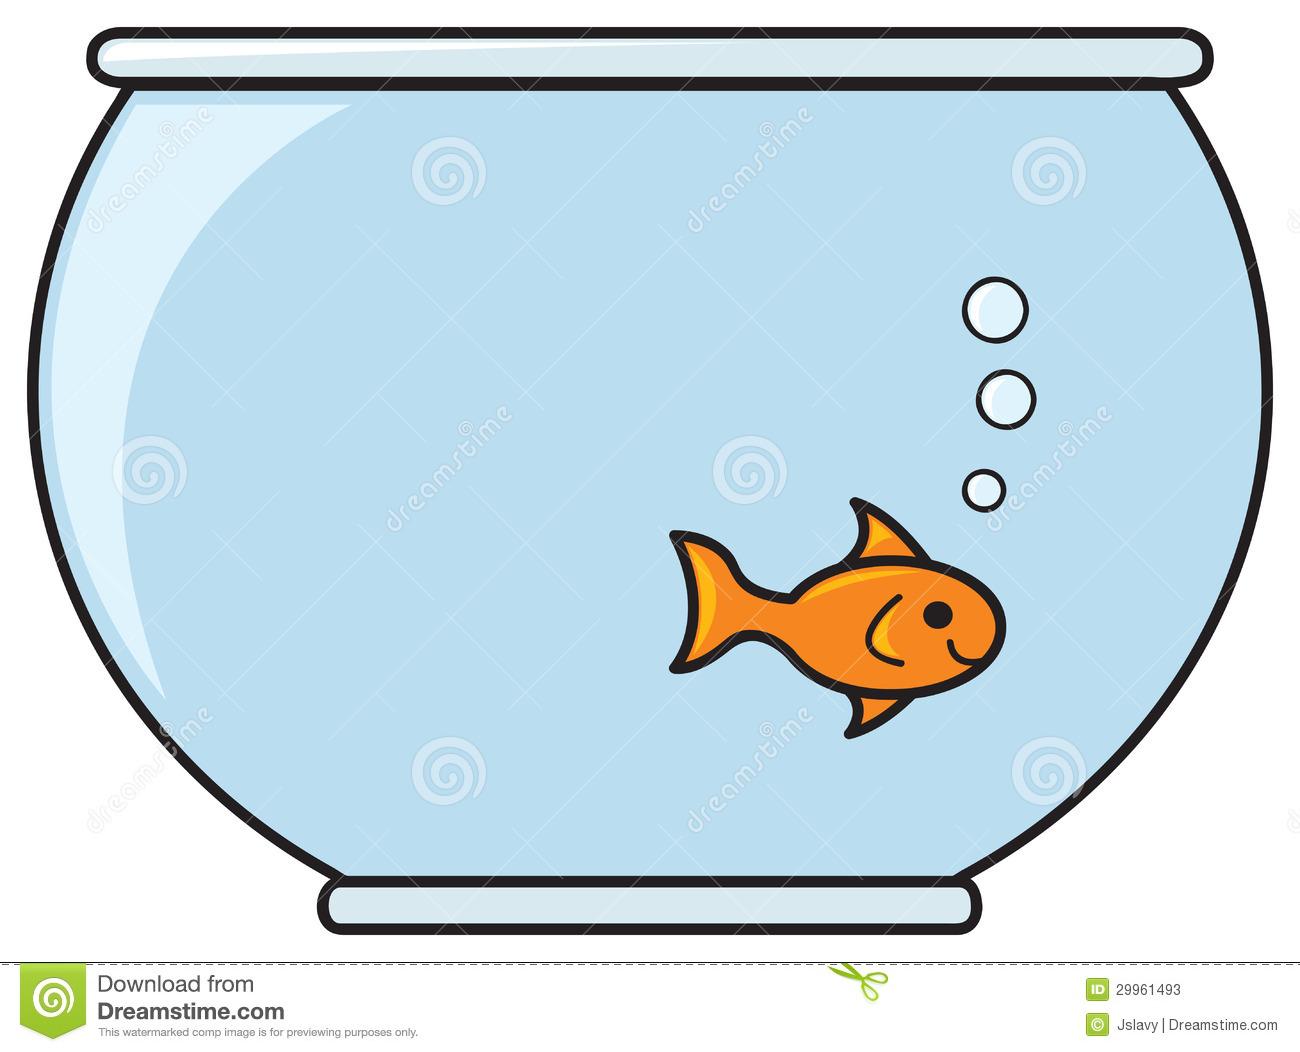 1300x1052 Fish Tank Clipart Goldfish Bowl